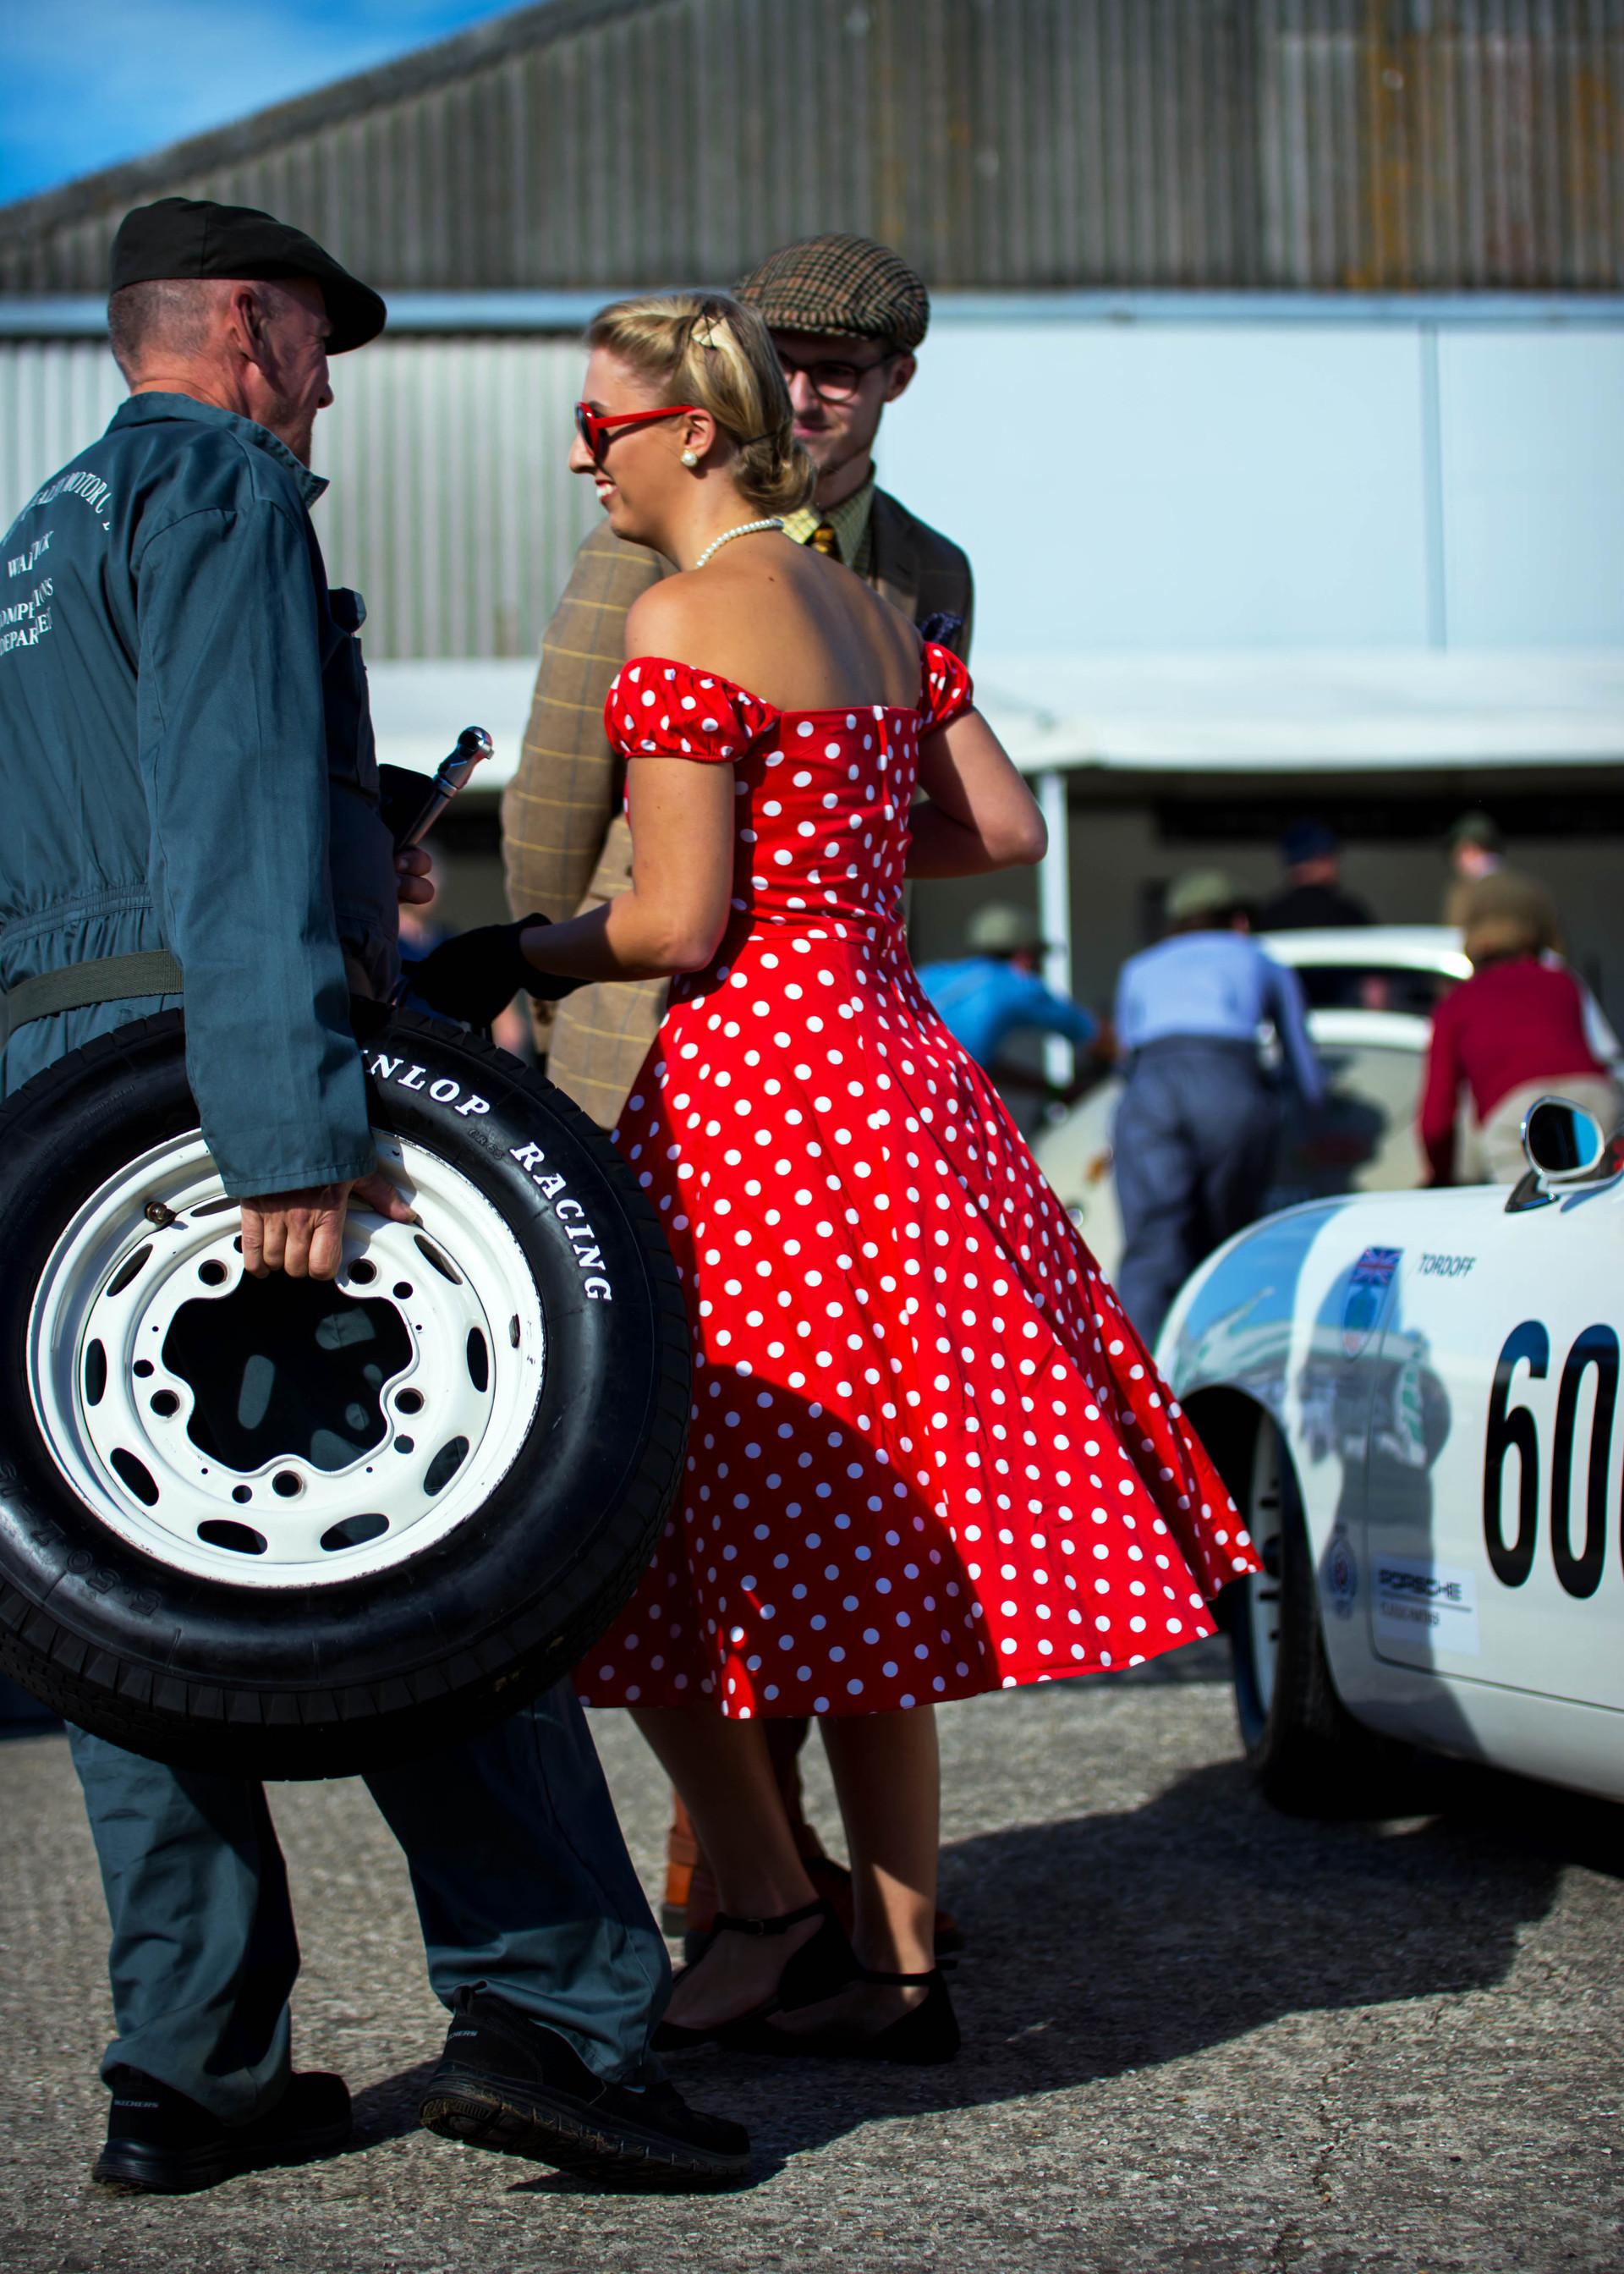 Sam Tordoff's 1953 Porsche 356